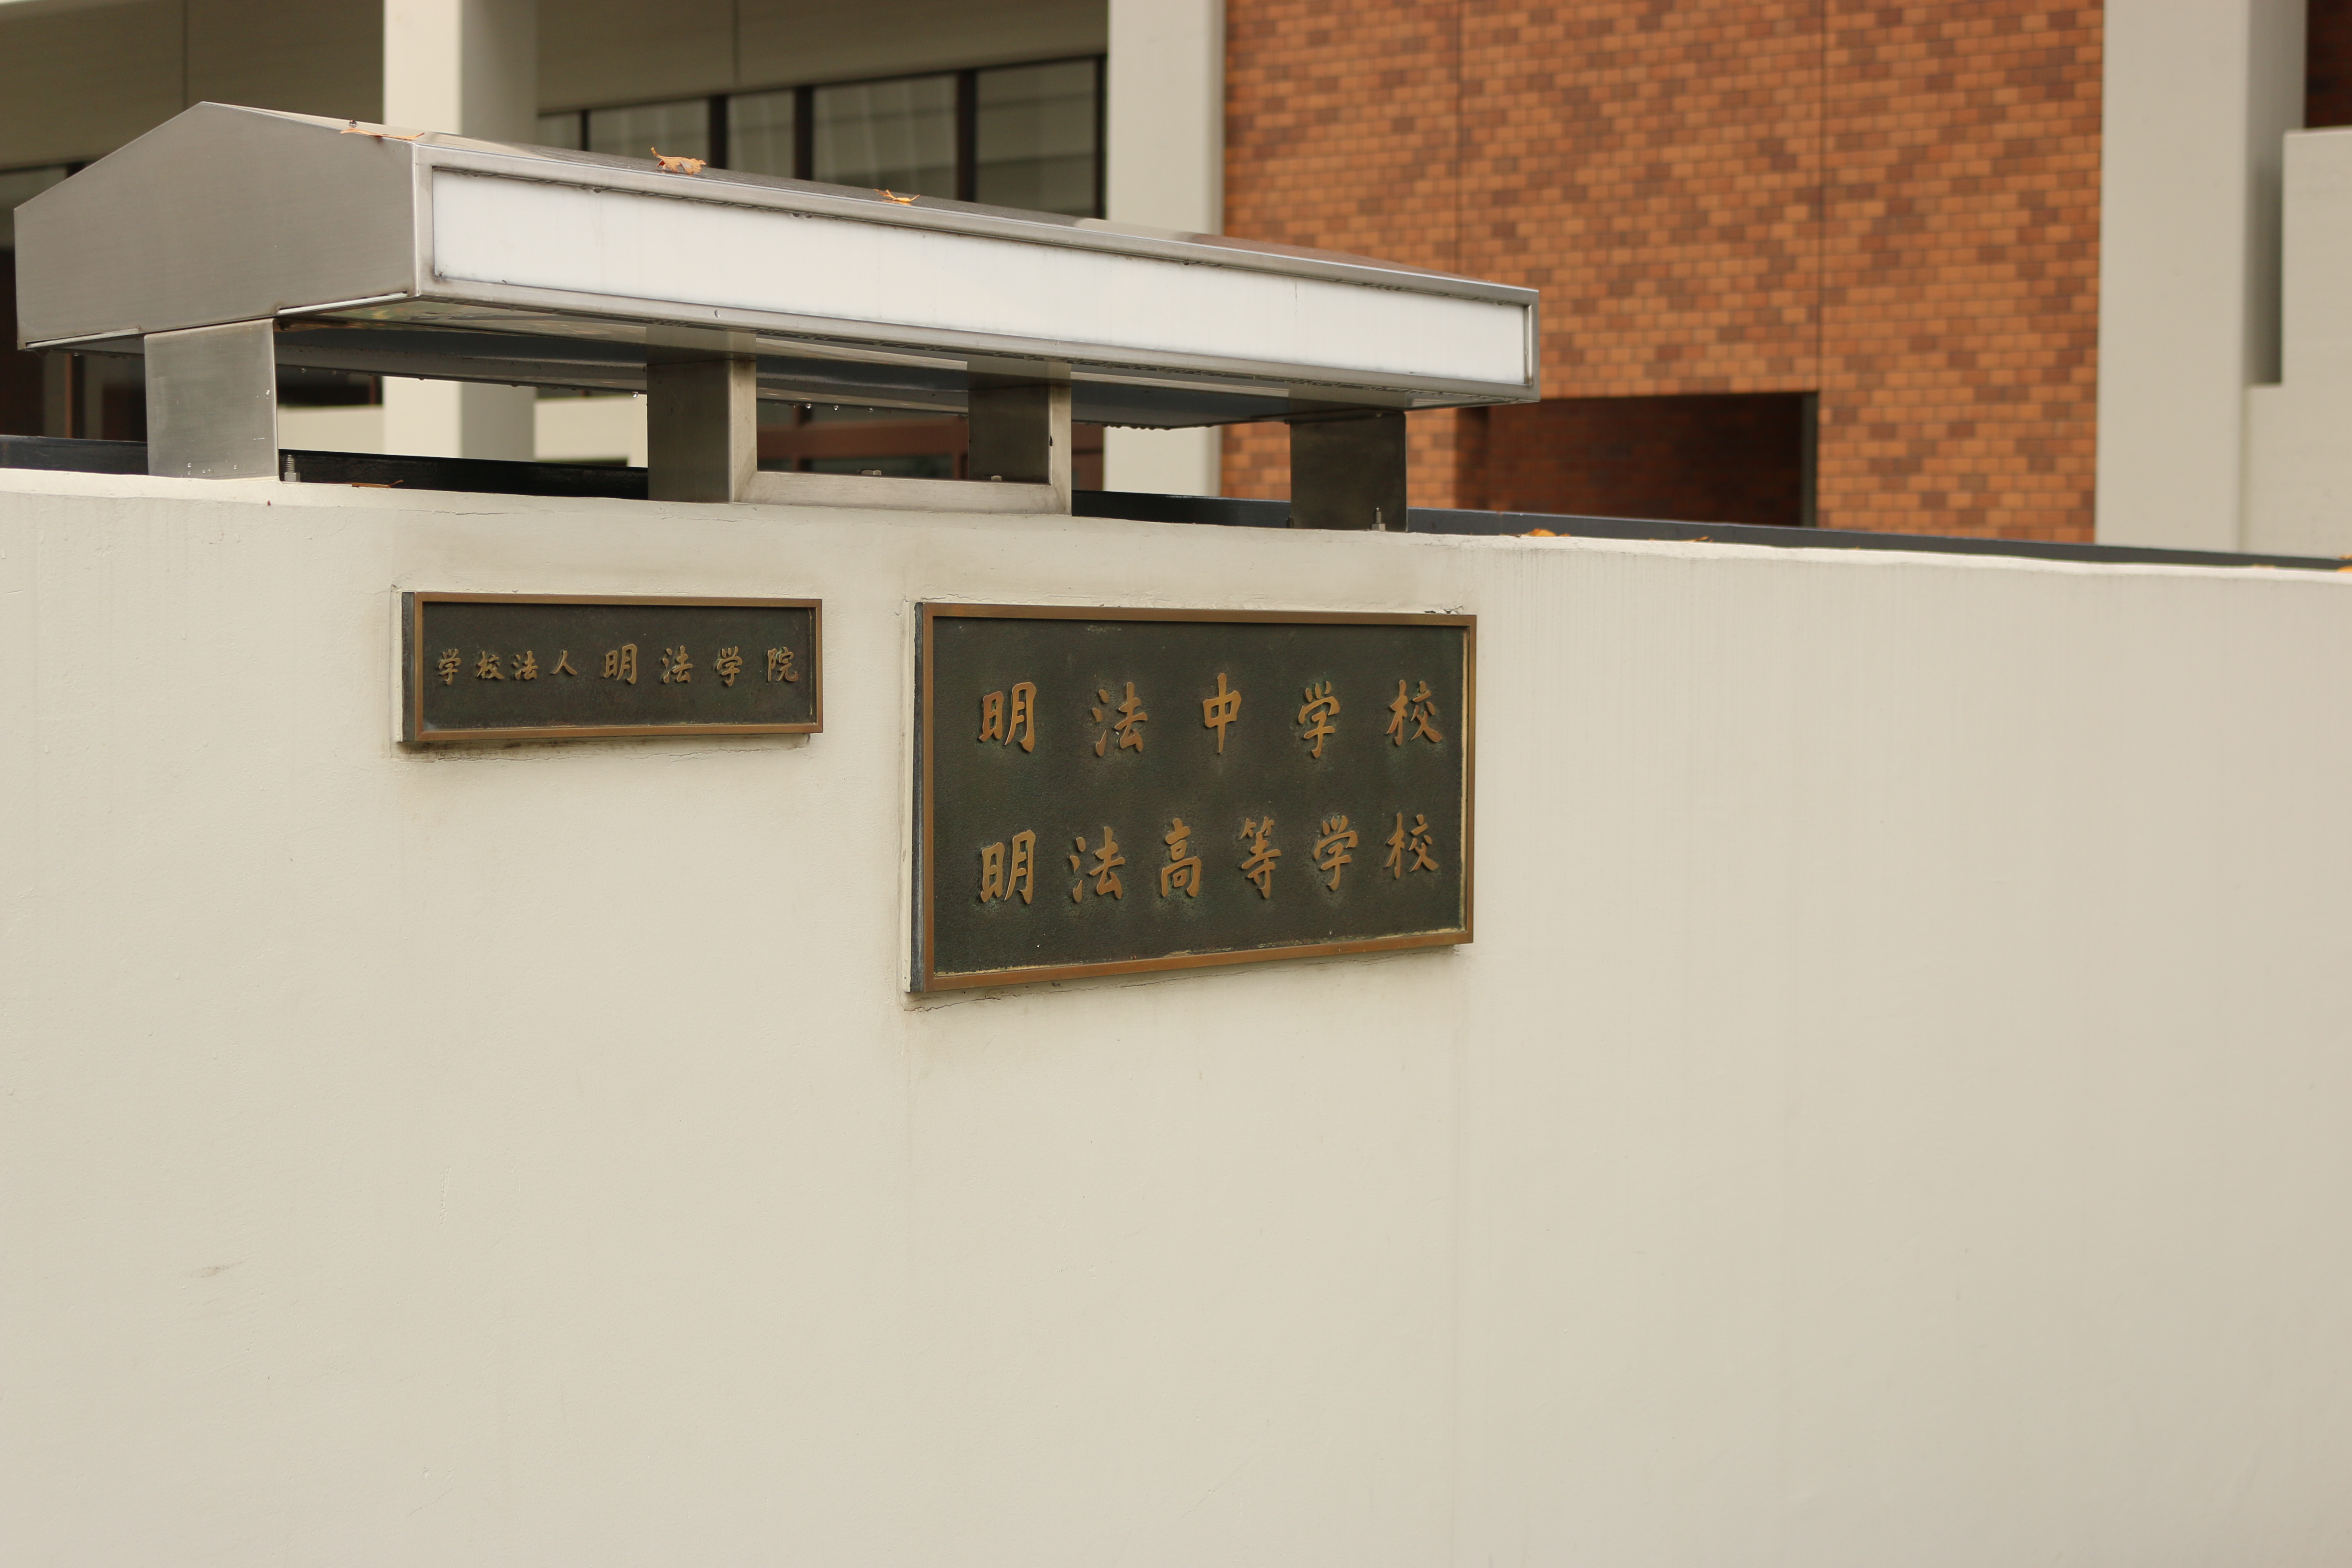 meiho school